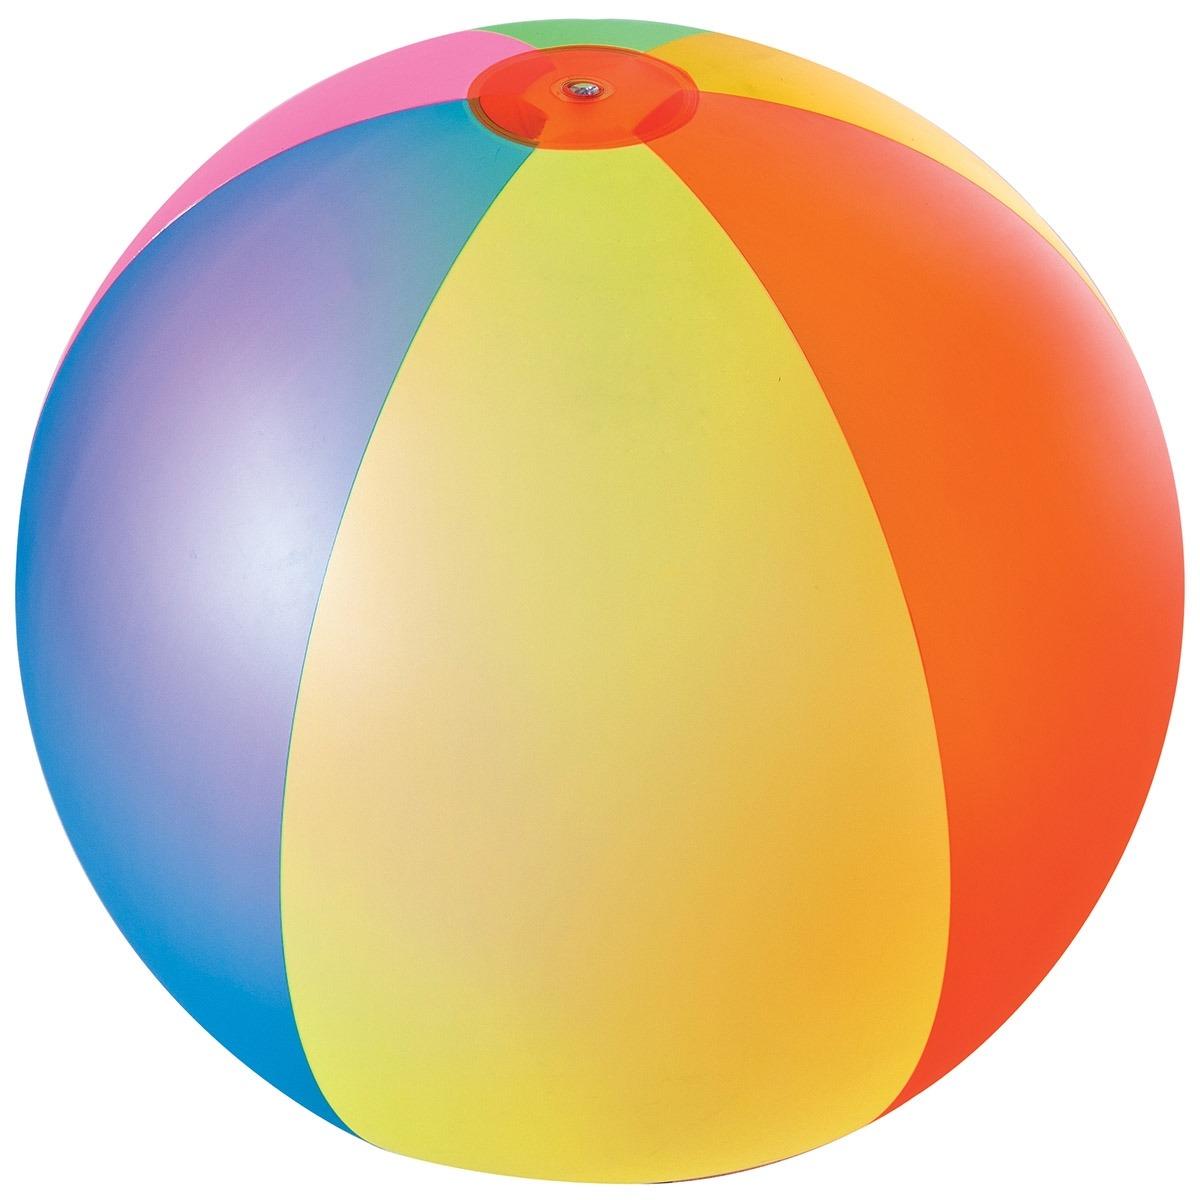 Bola infl vel gigante colorida para praia e piscina mor for Bolas para piscina de bolas